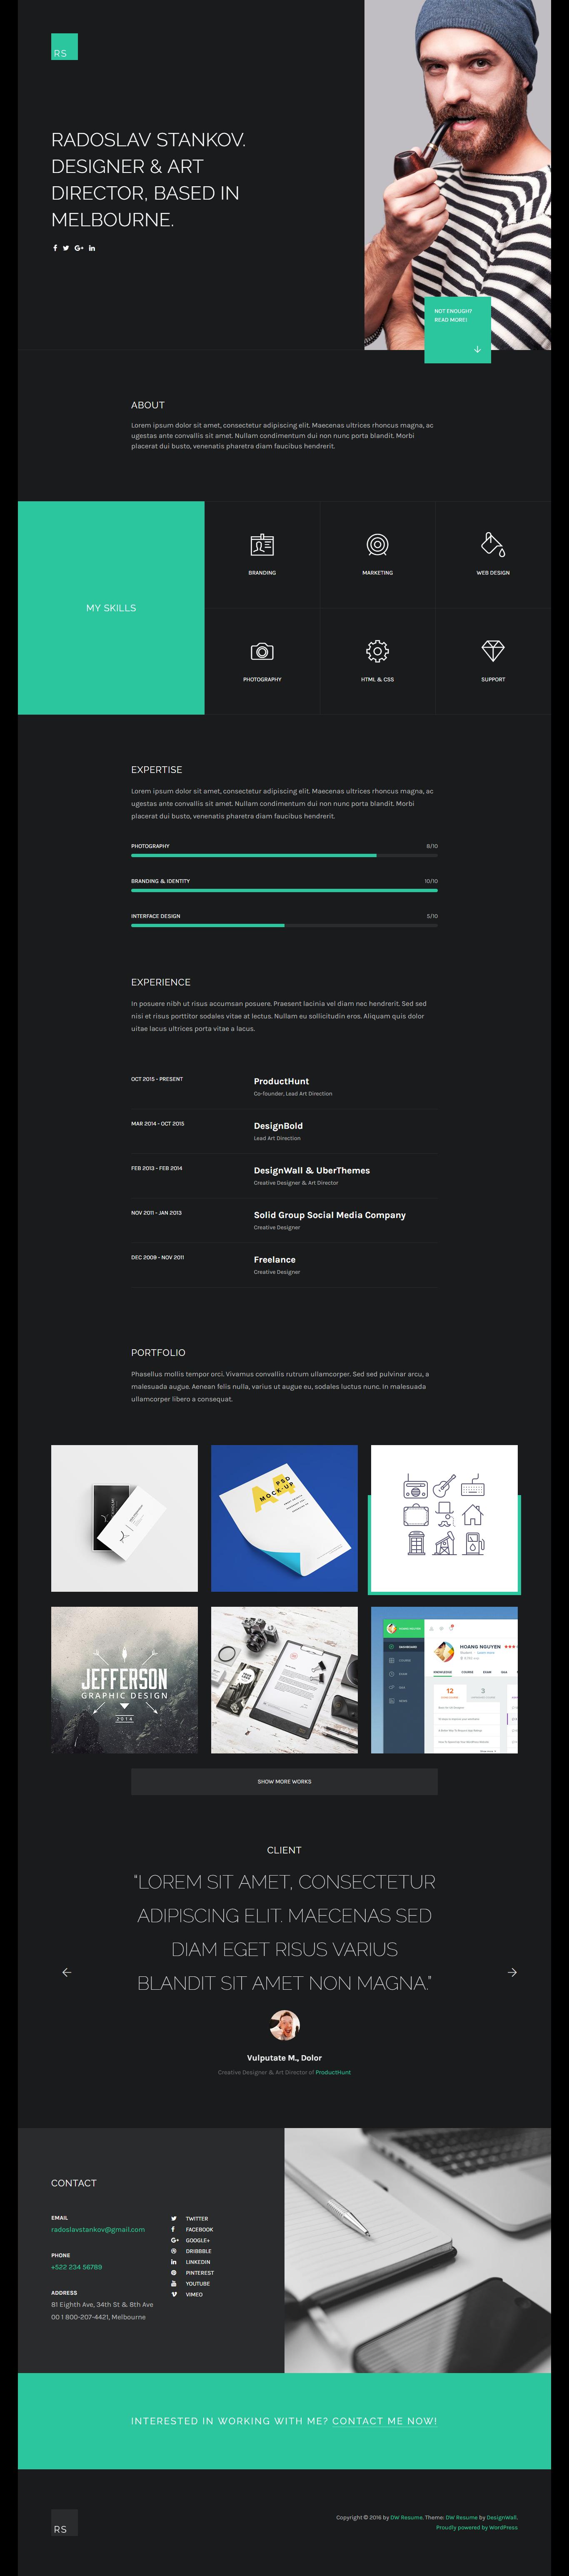 Responsive WordPress CV & Portfolio Theme DW Resumé